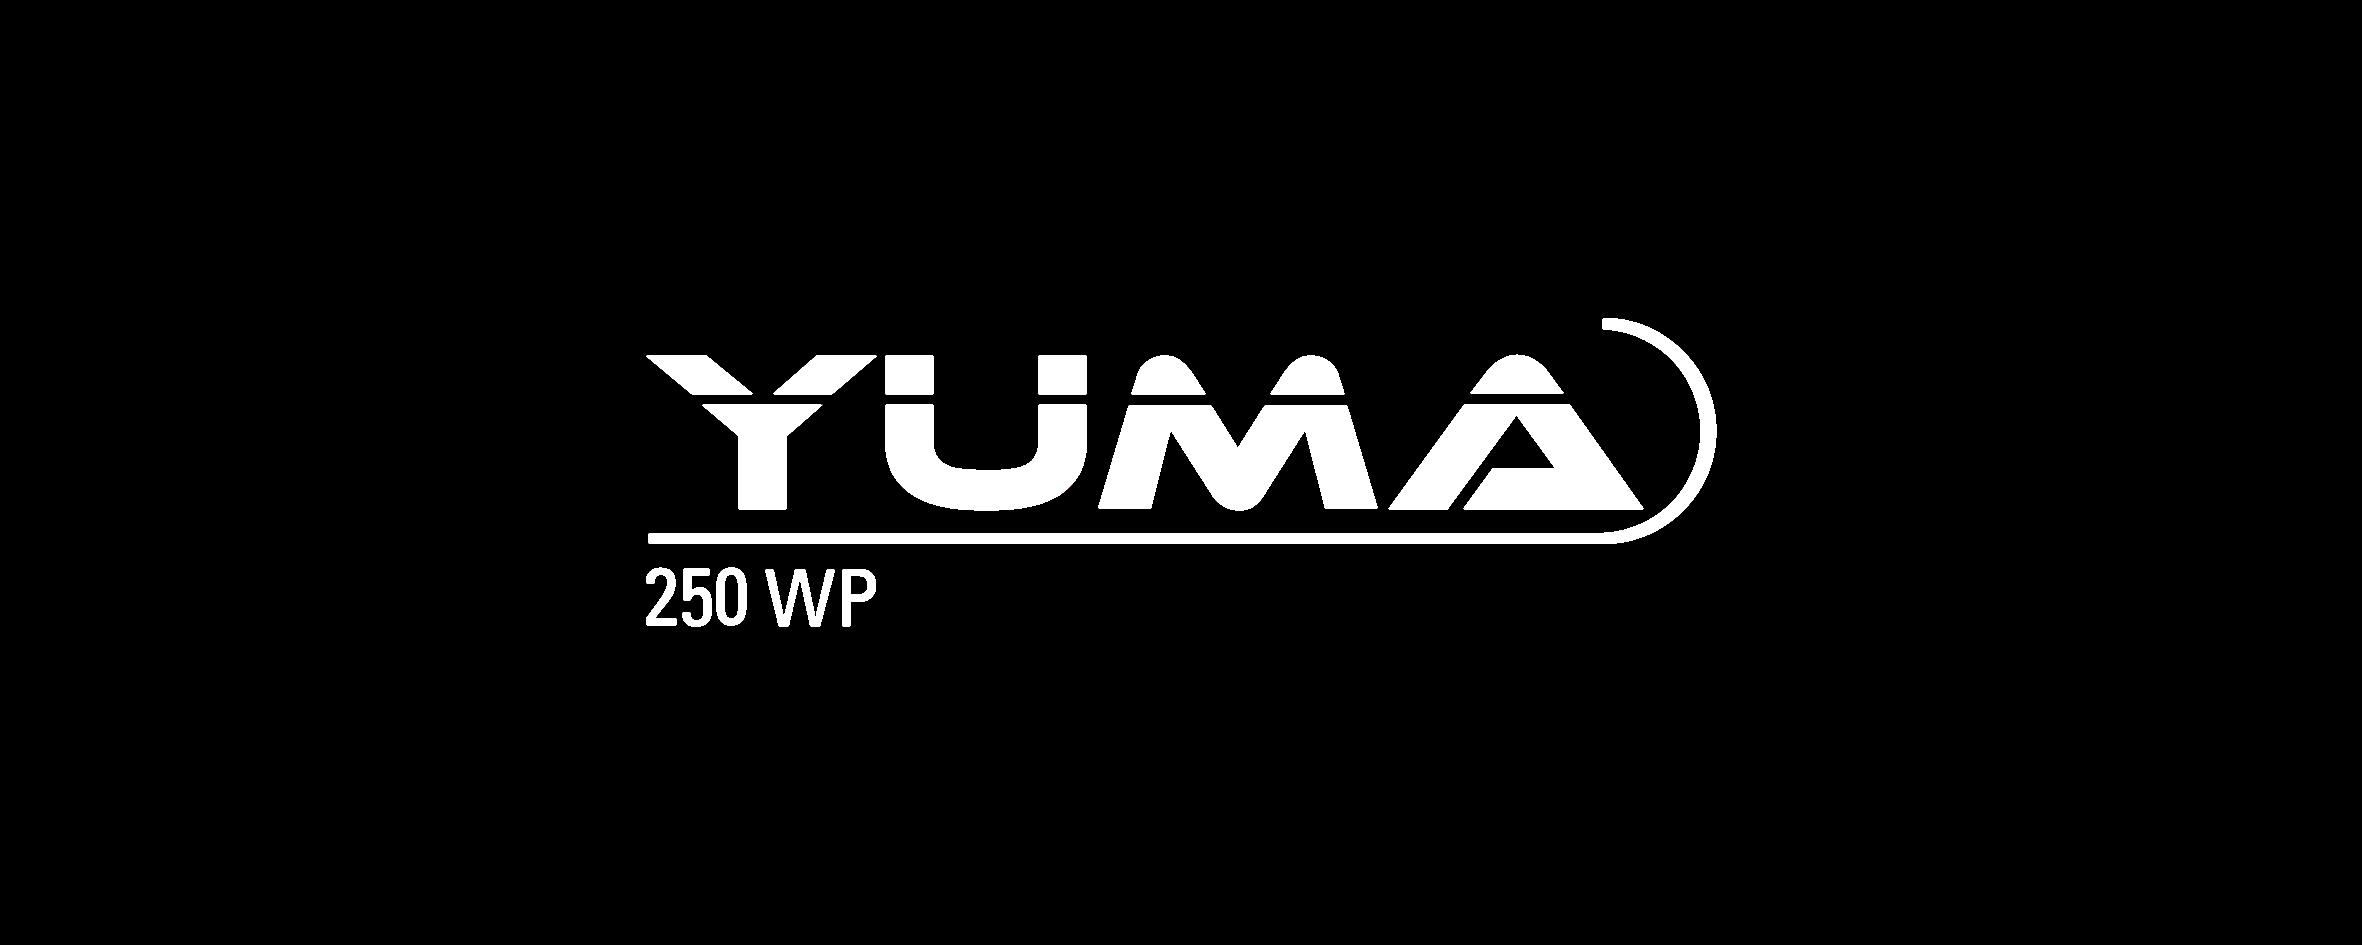 FUNGICIDAS_YUMA_White